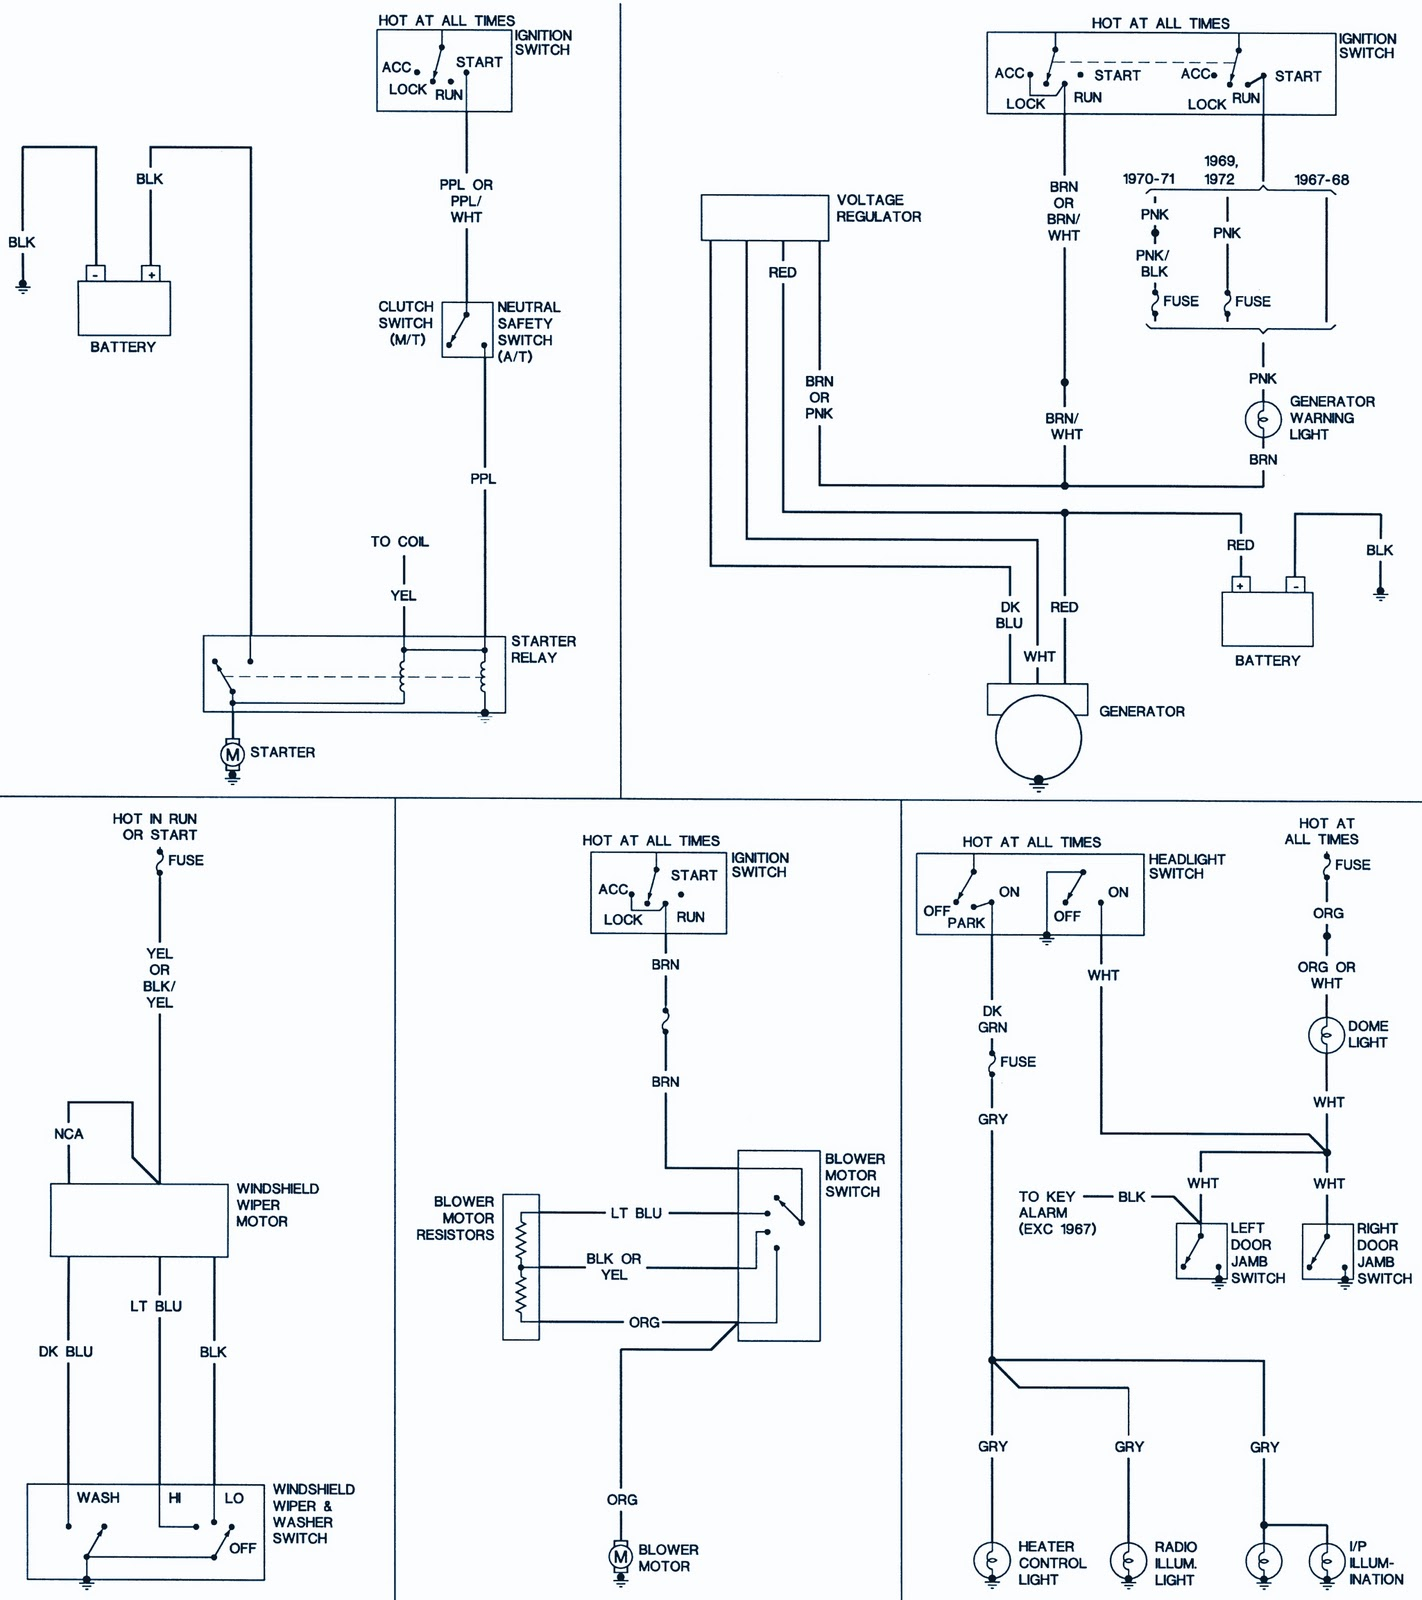 196769 Chevrolet Camaro Wiring Diagrams | Schematic Wiring Diagrams Solutions